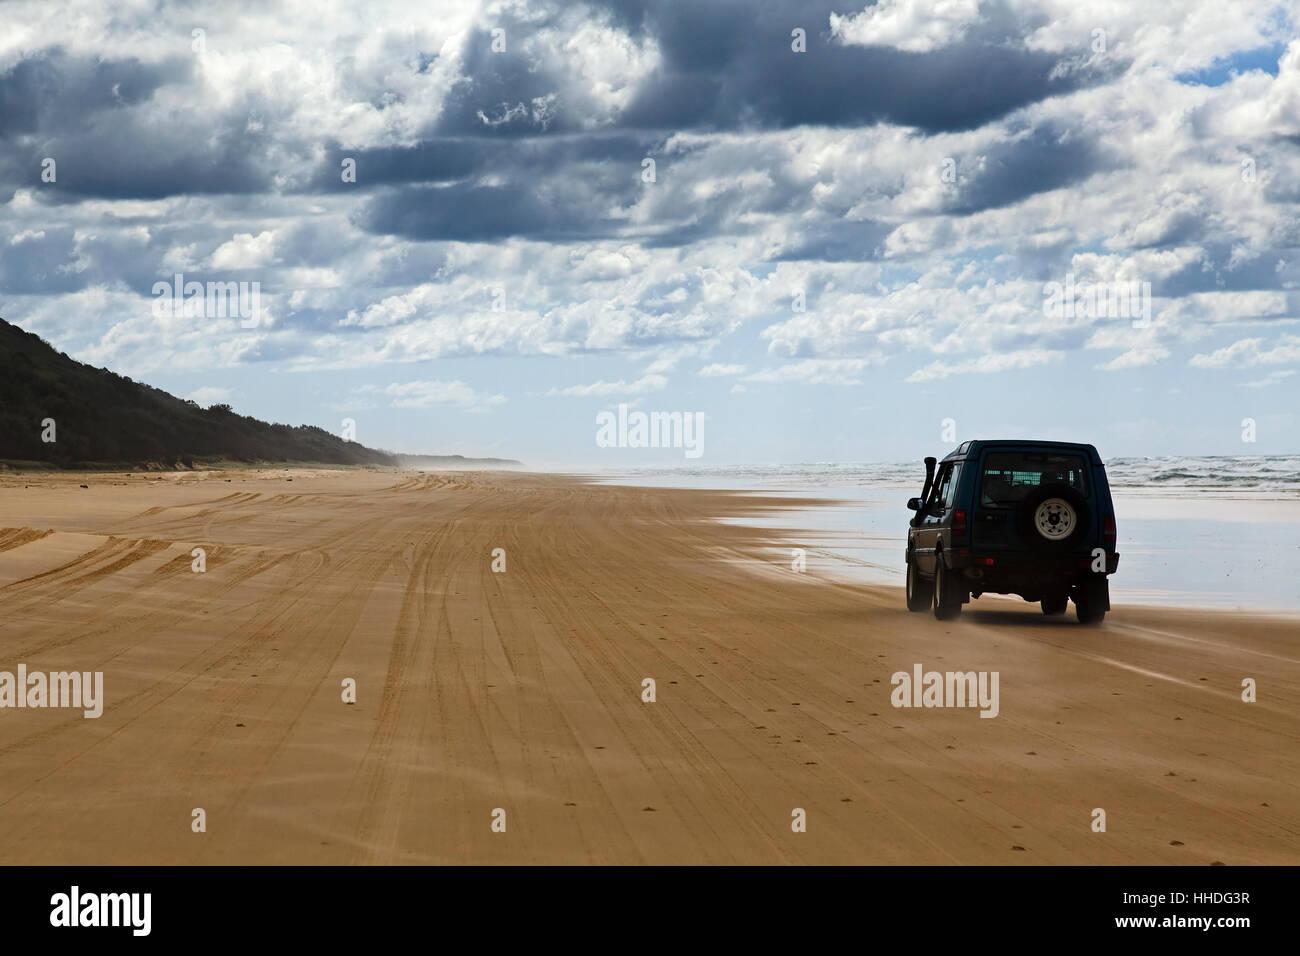 Main transportation highway on Fraser Island - wide wet sand beach coast facing Pacific ocean - long 75 miles beach. - Stock Image